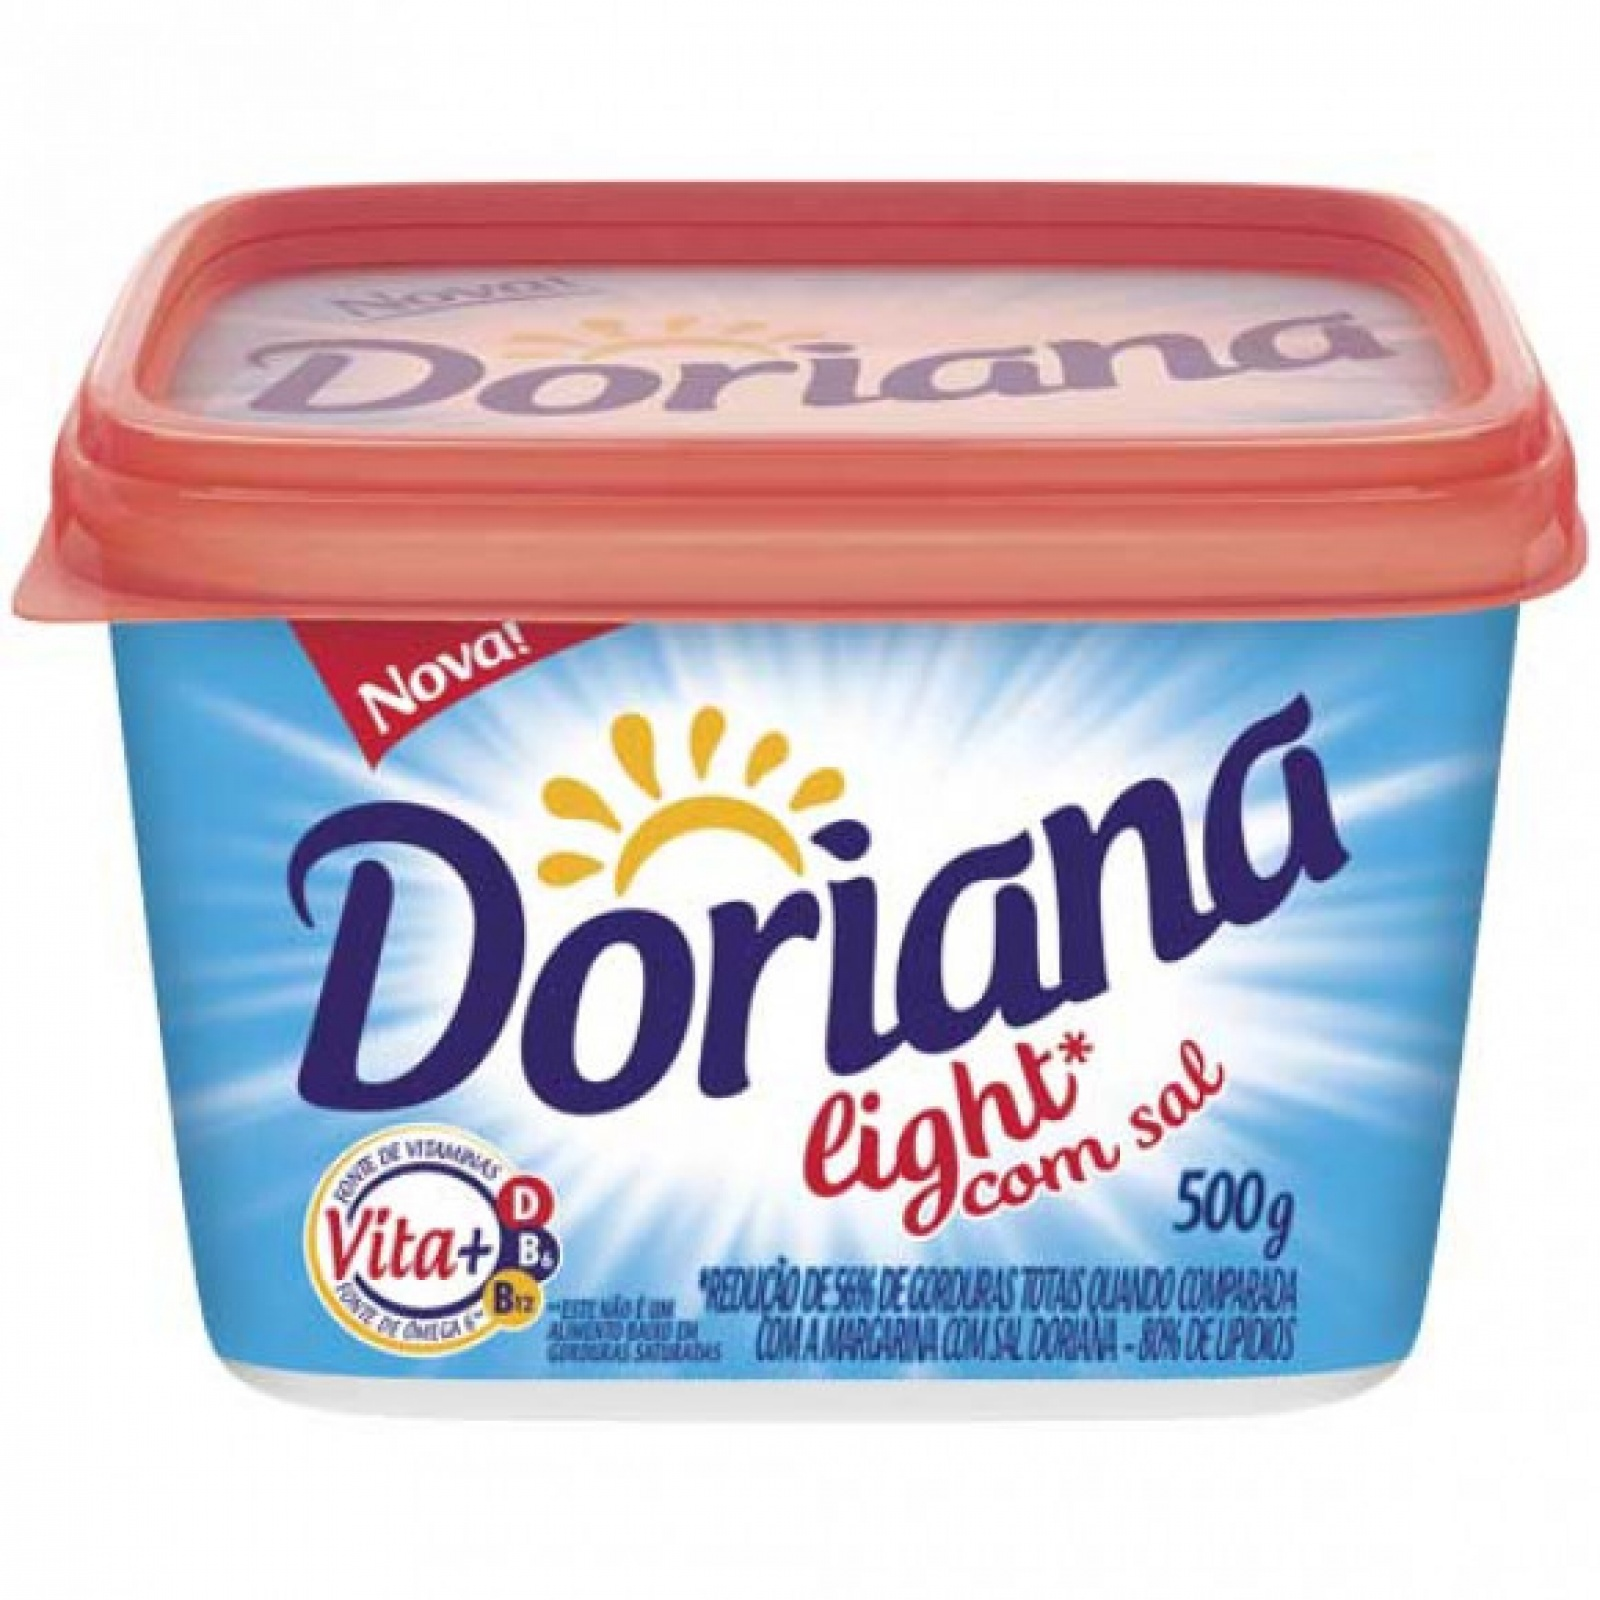 Margarina Doriana Light C/ sal 500g